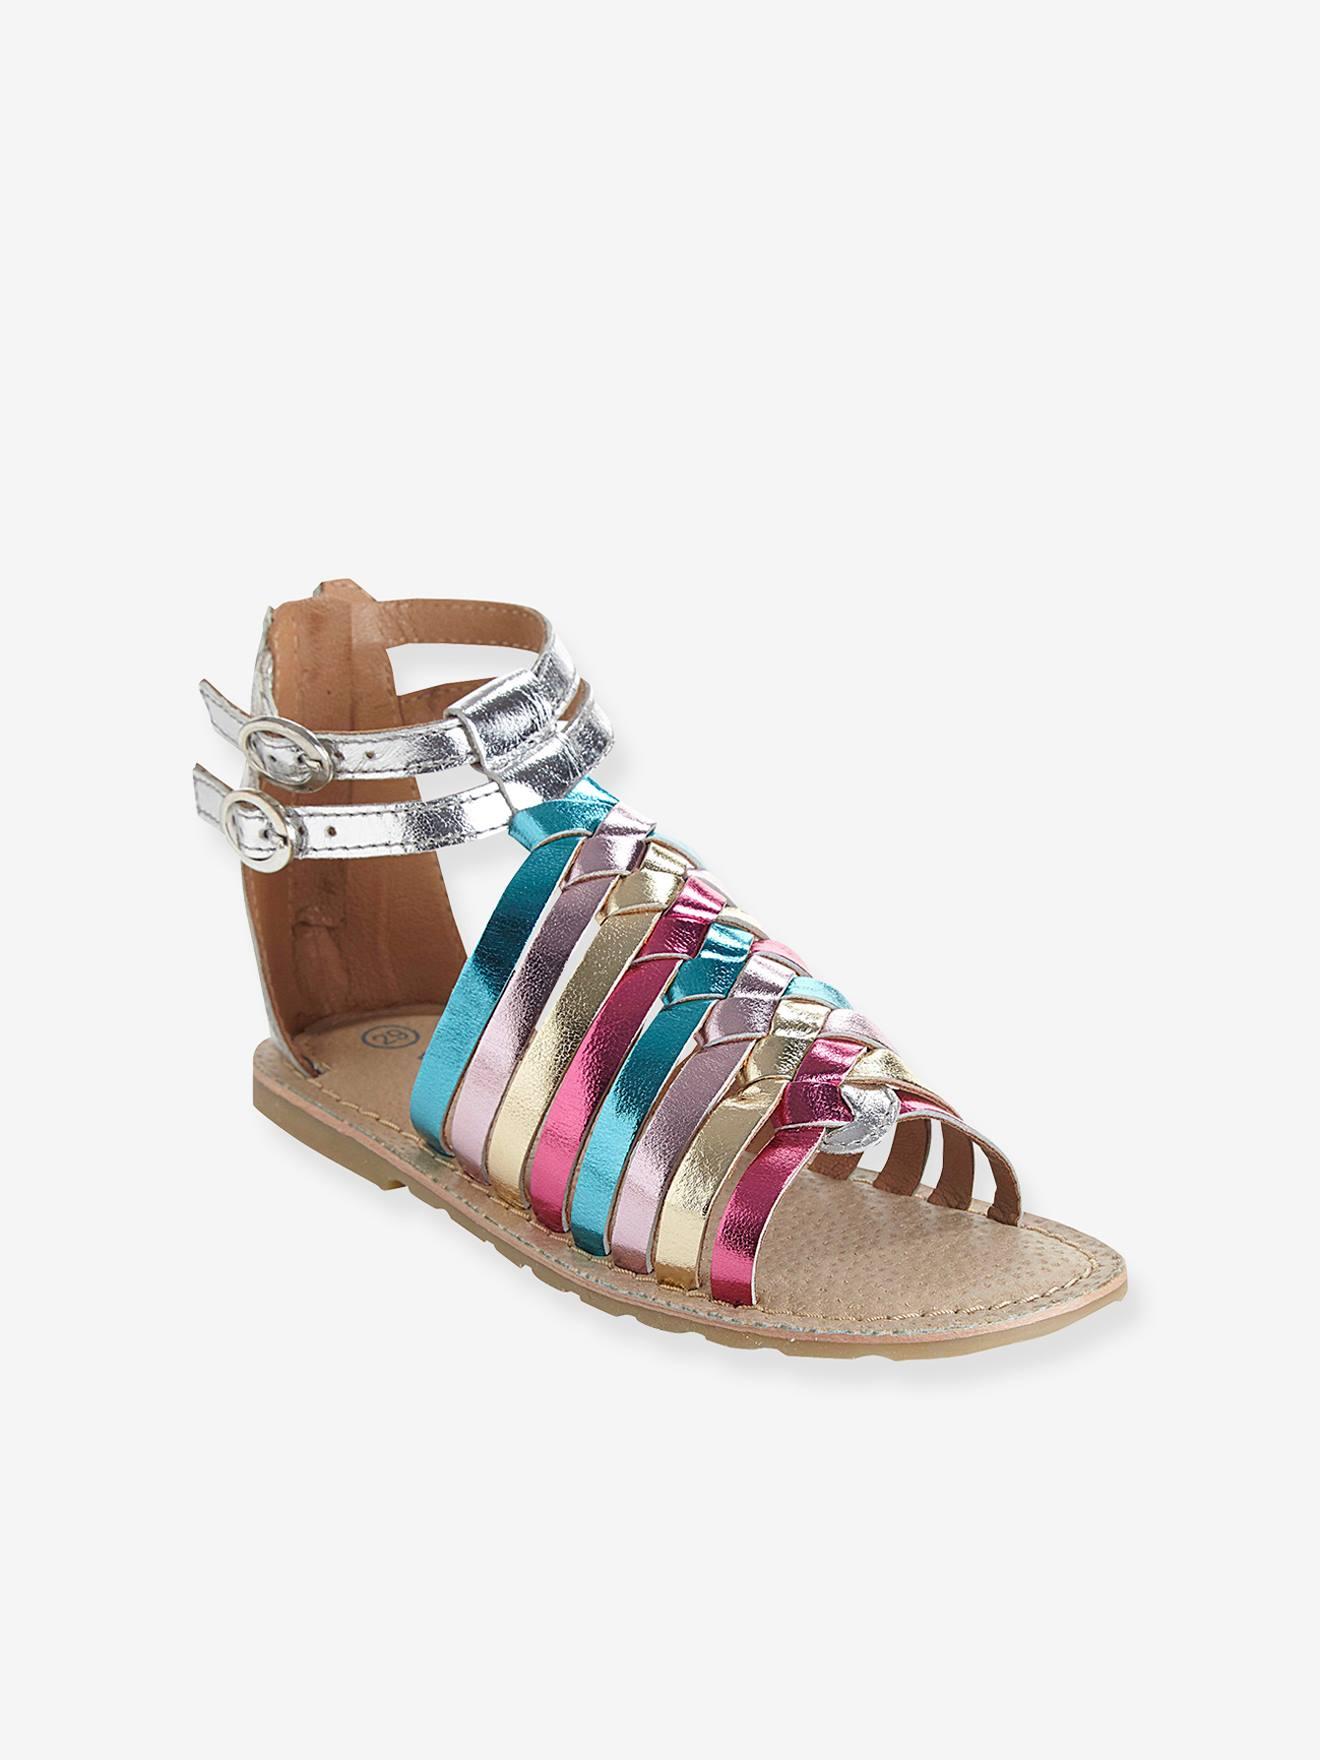 Multicolour Sandals SilverShoes Girls Leather PXZiuTOlwk